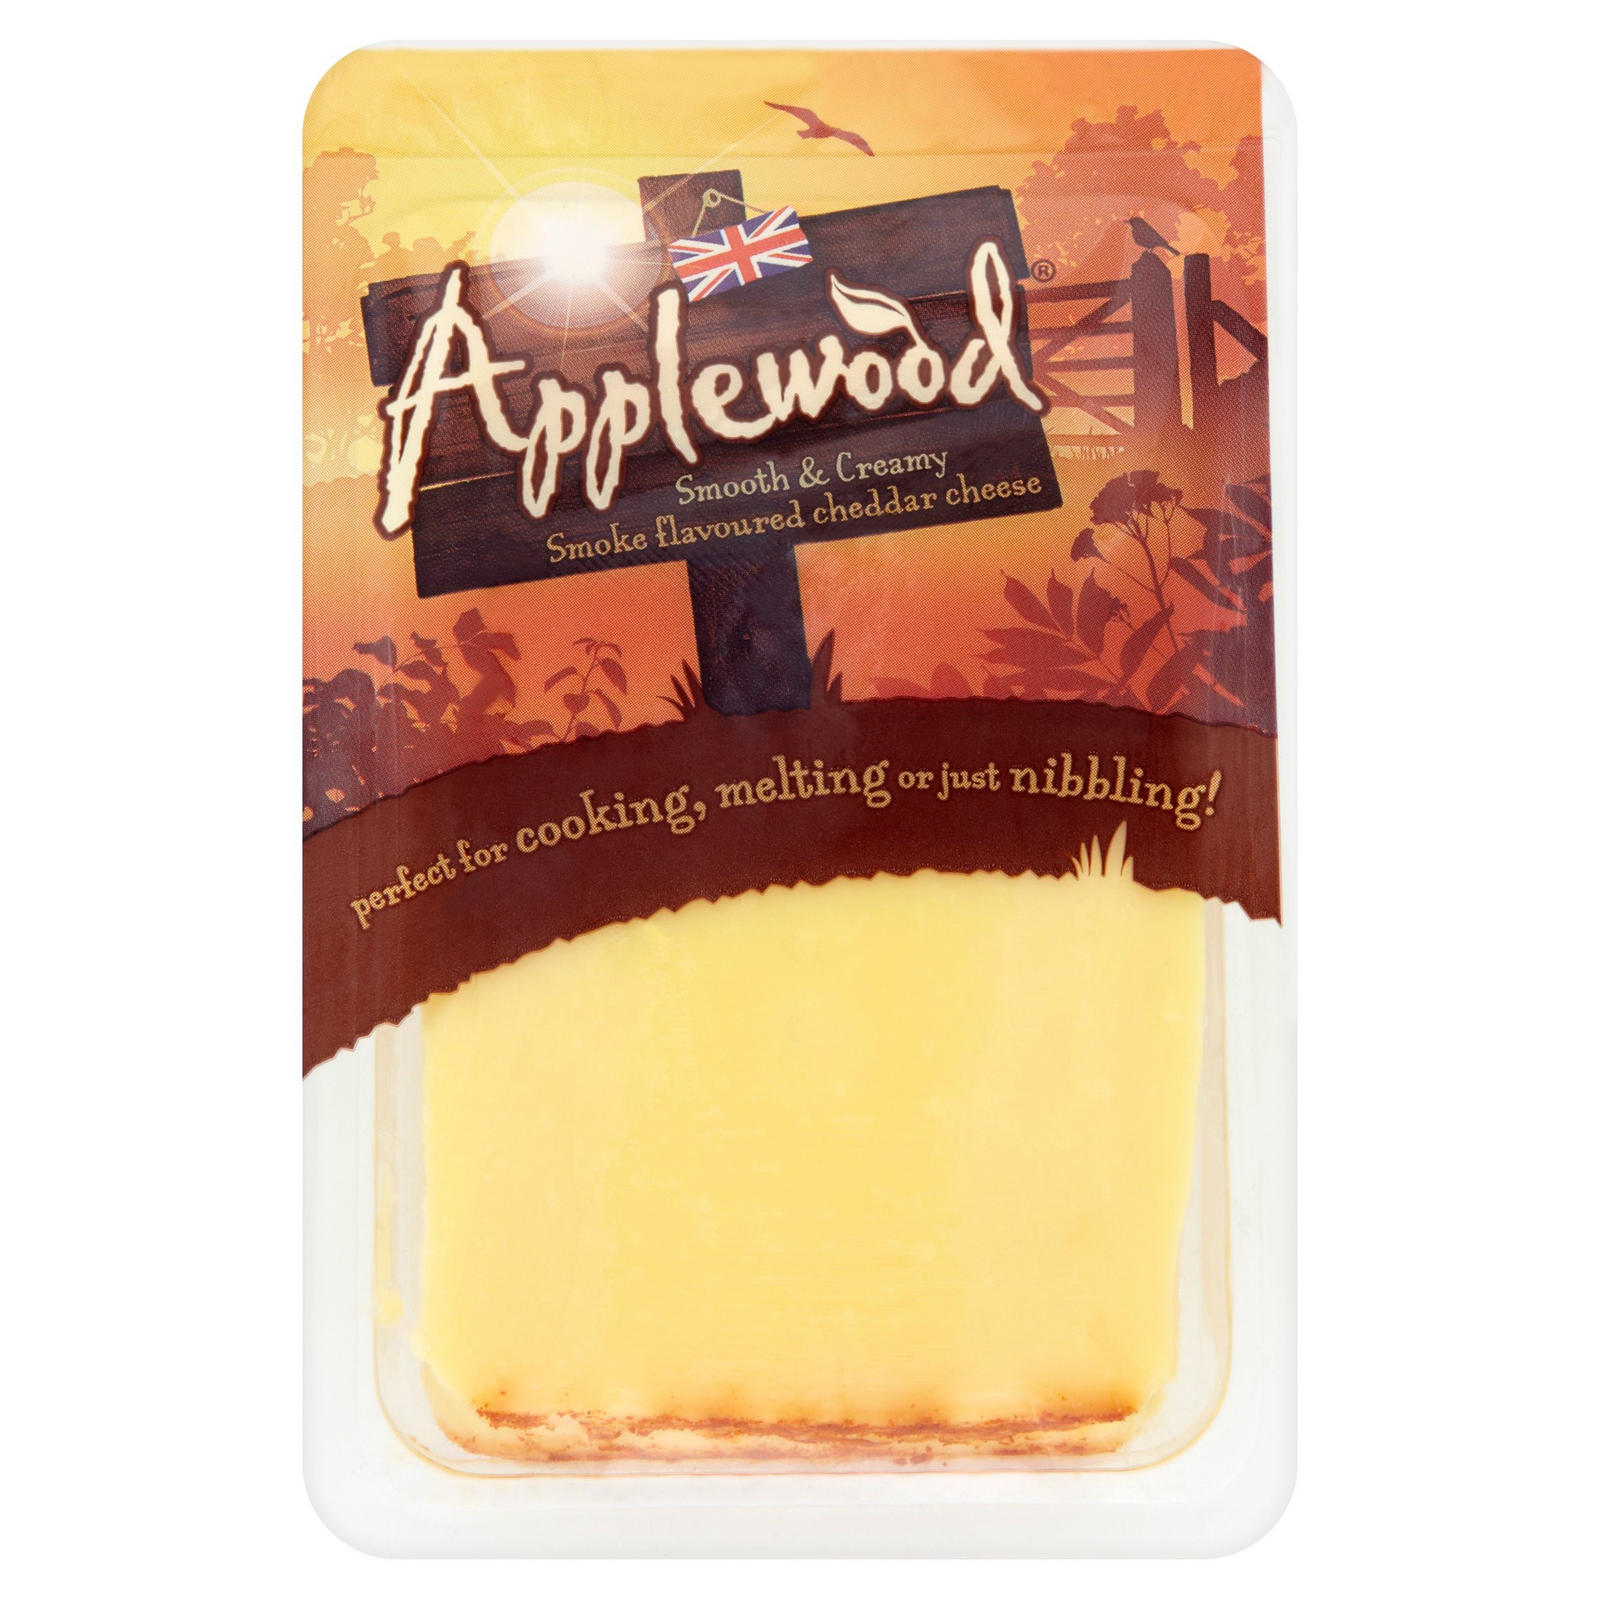 Applewood smoked cheese